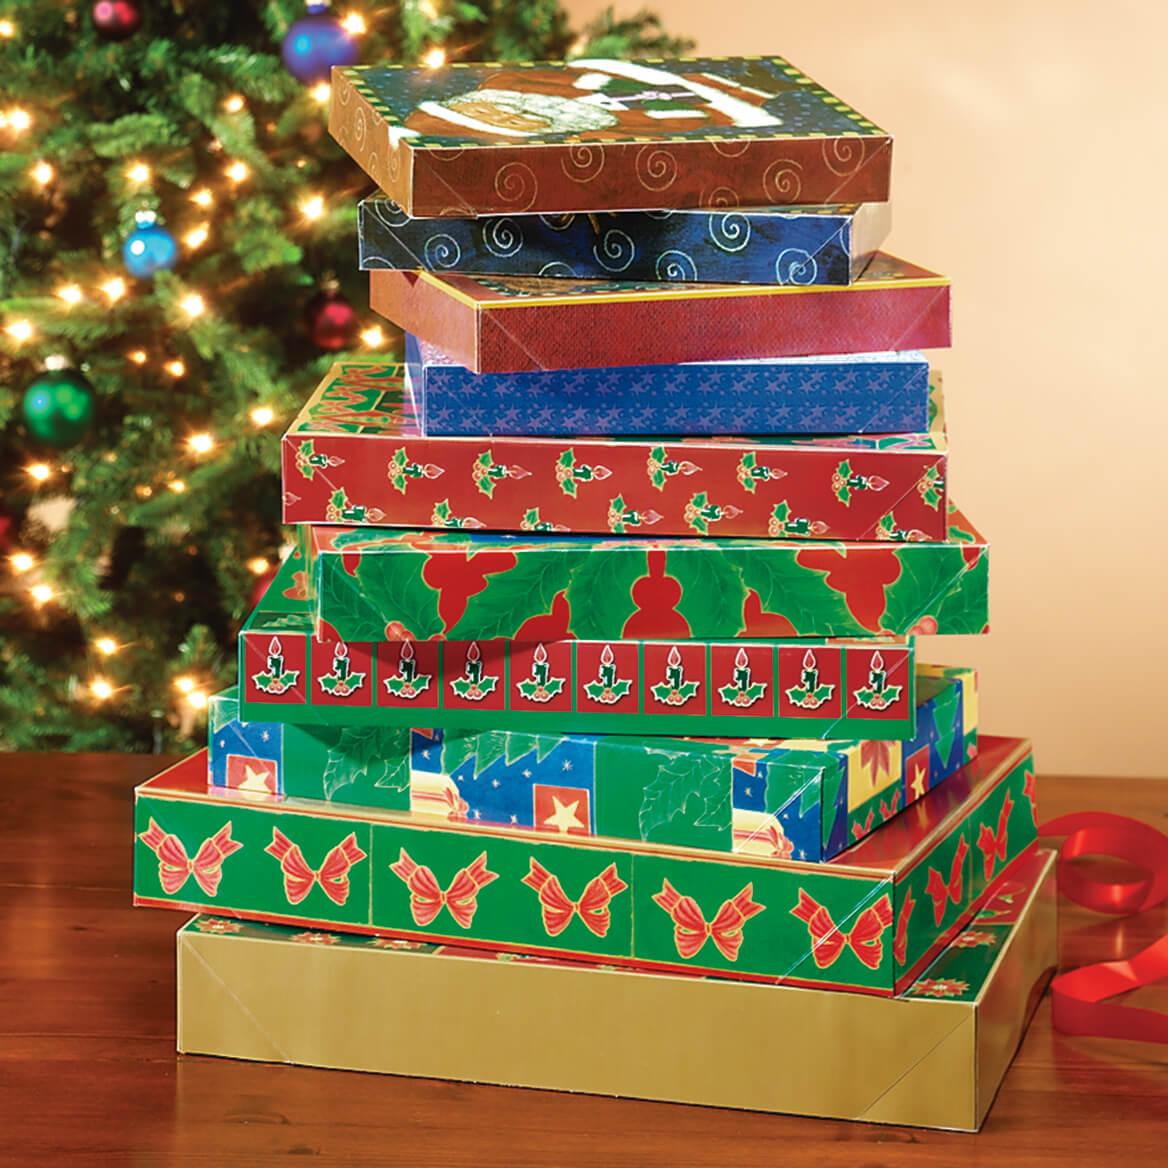 Christmas Gift Boxes - Set of 10